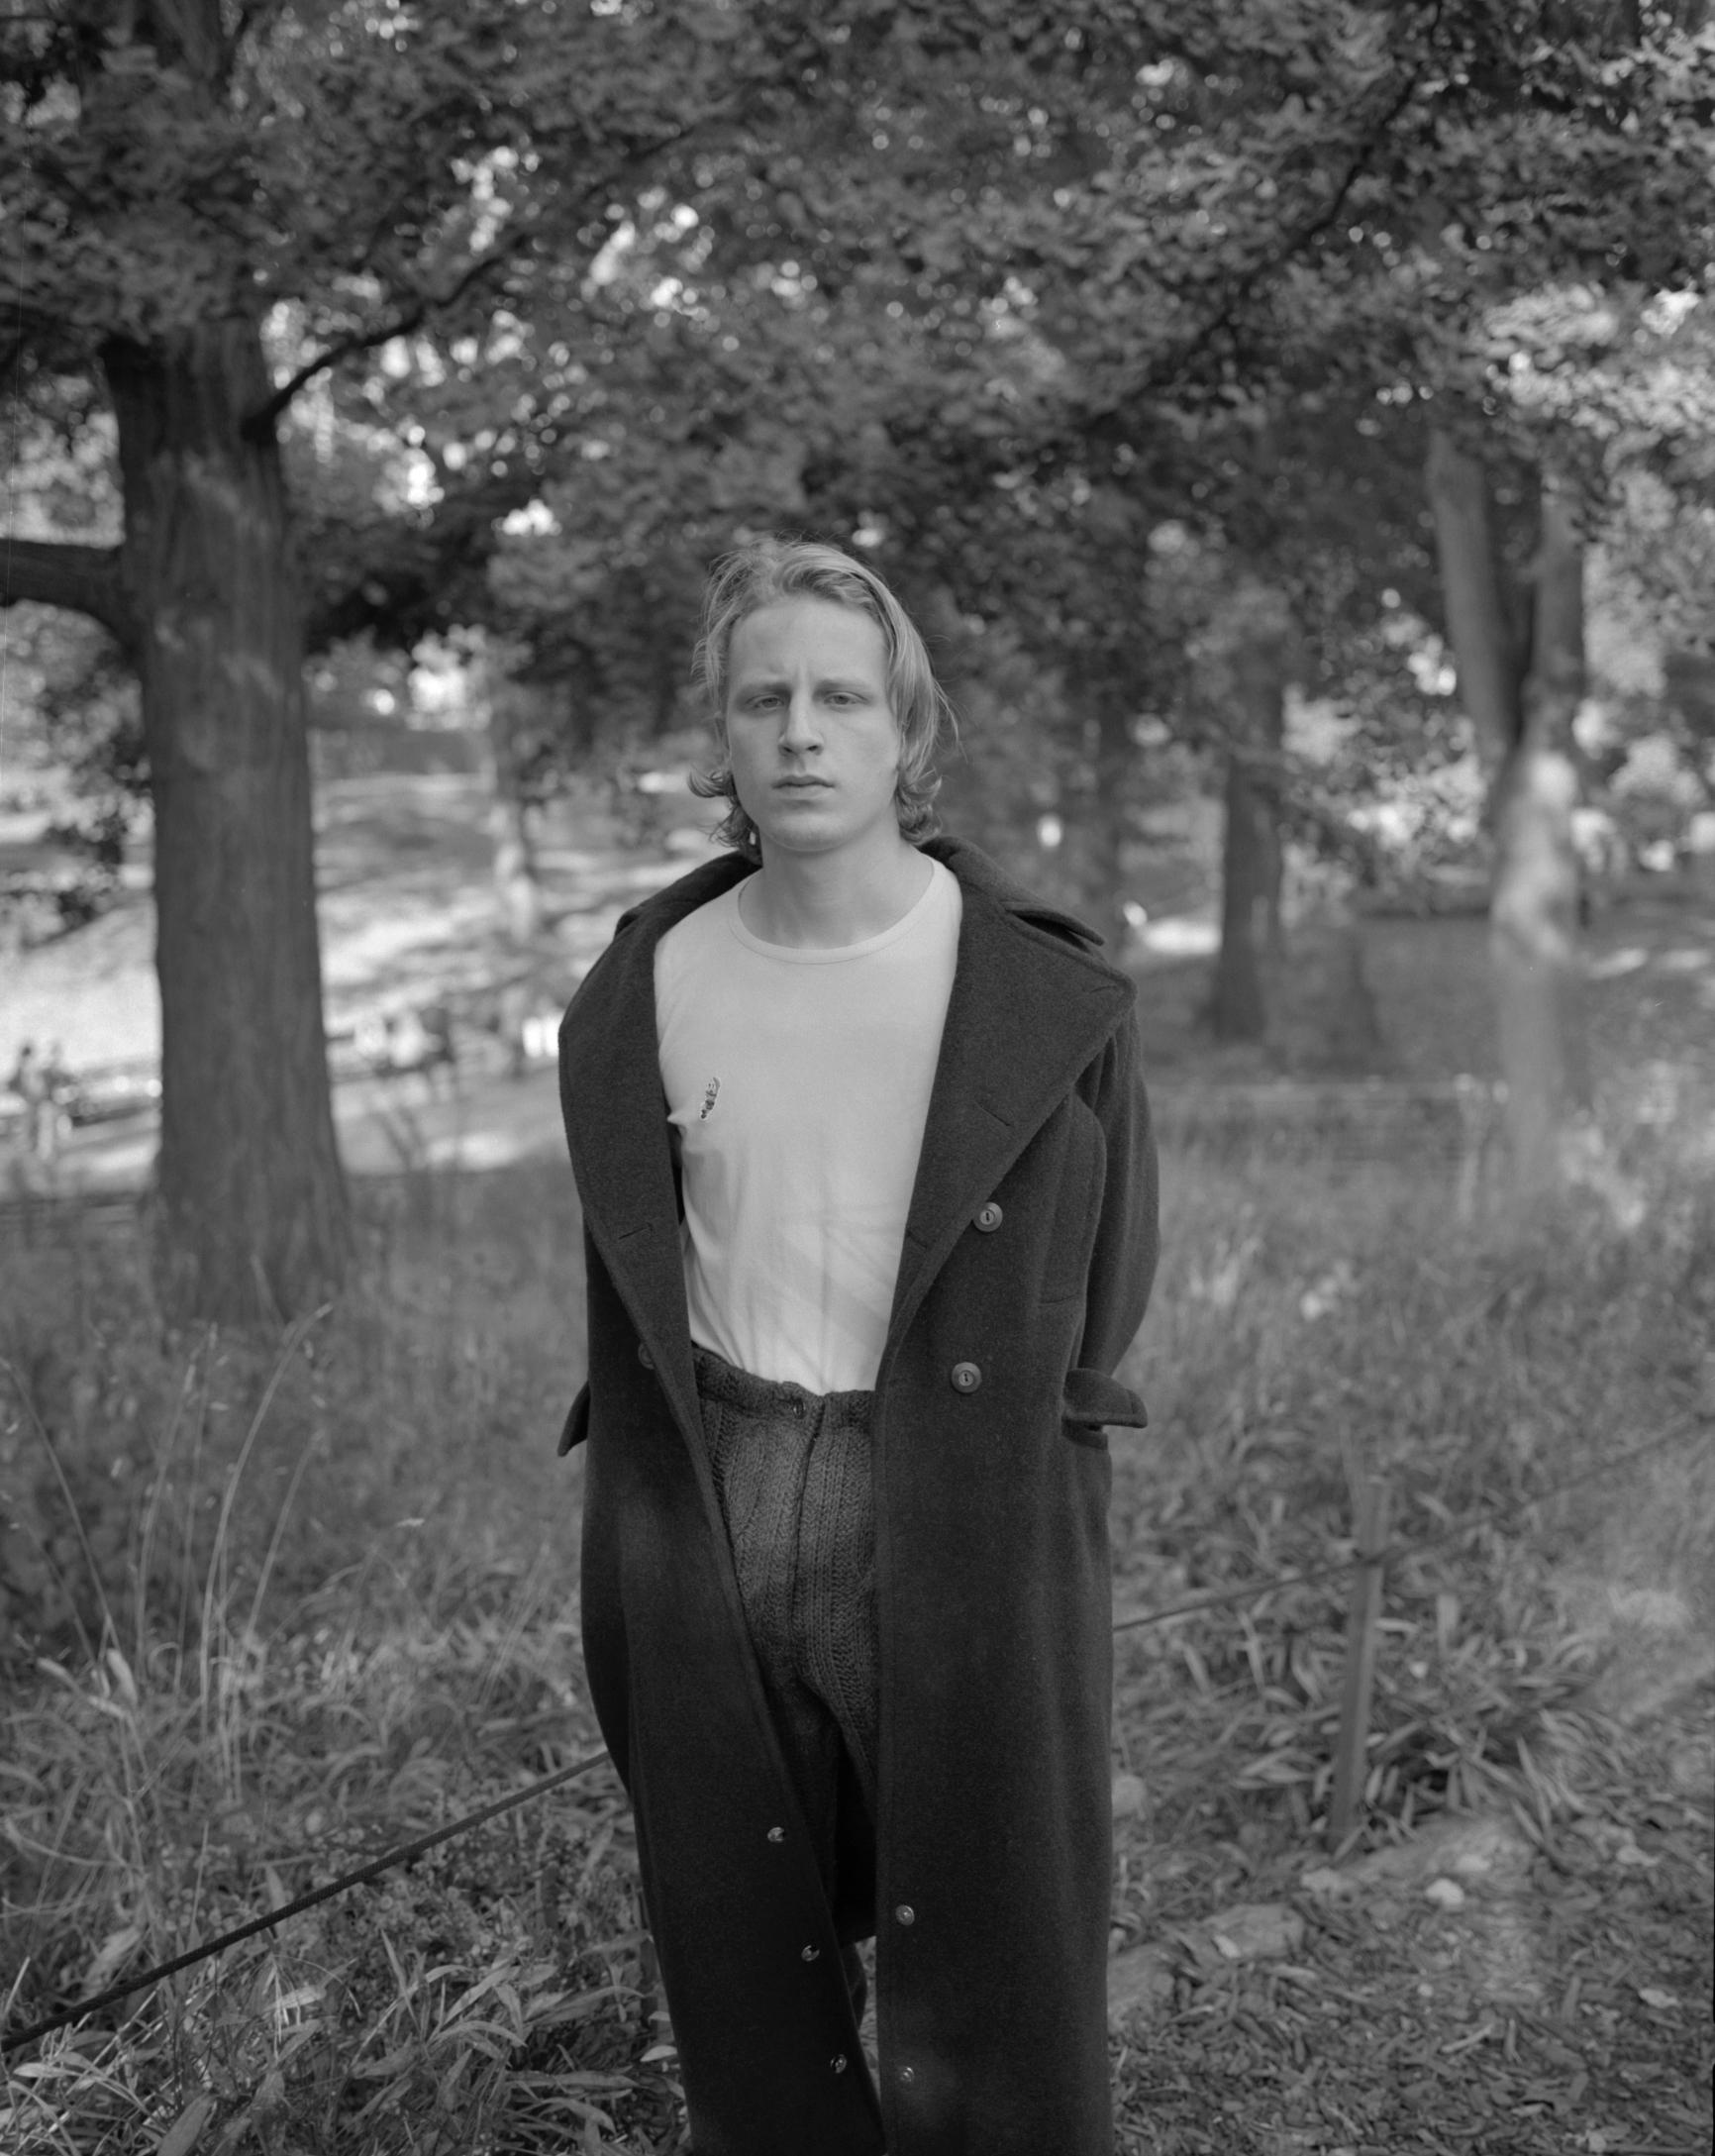 Noah at the Park - James Veloria  Photography Nicholas Pollack